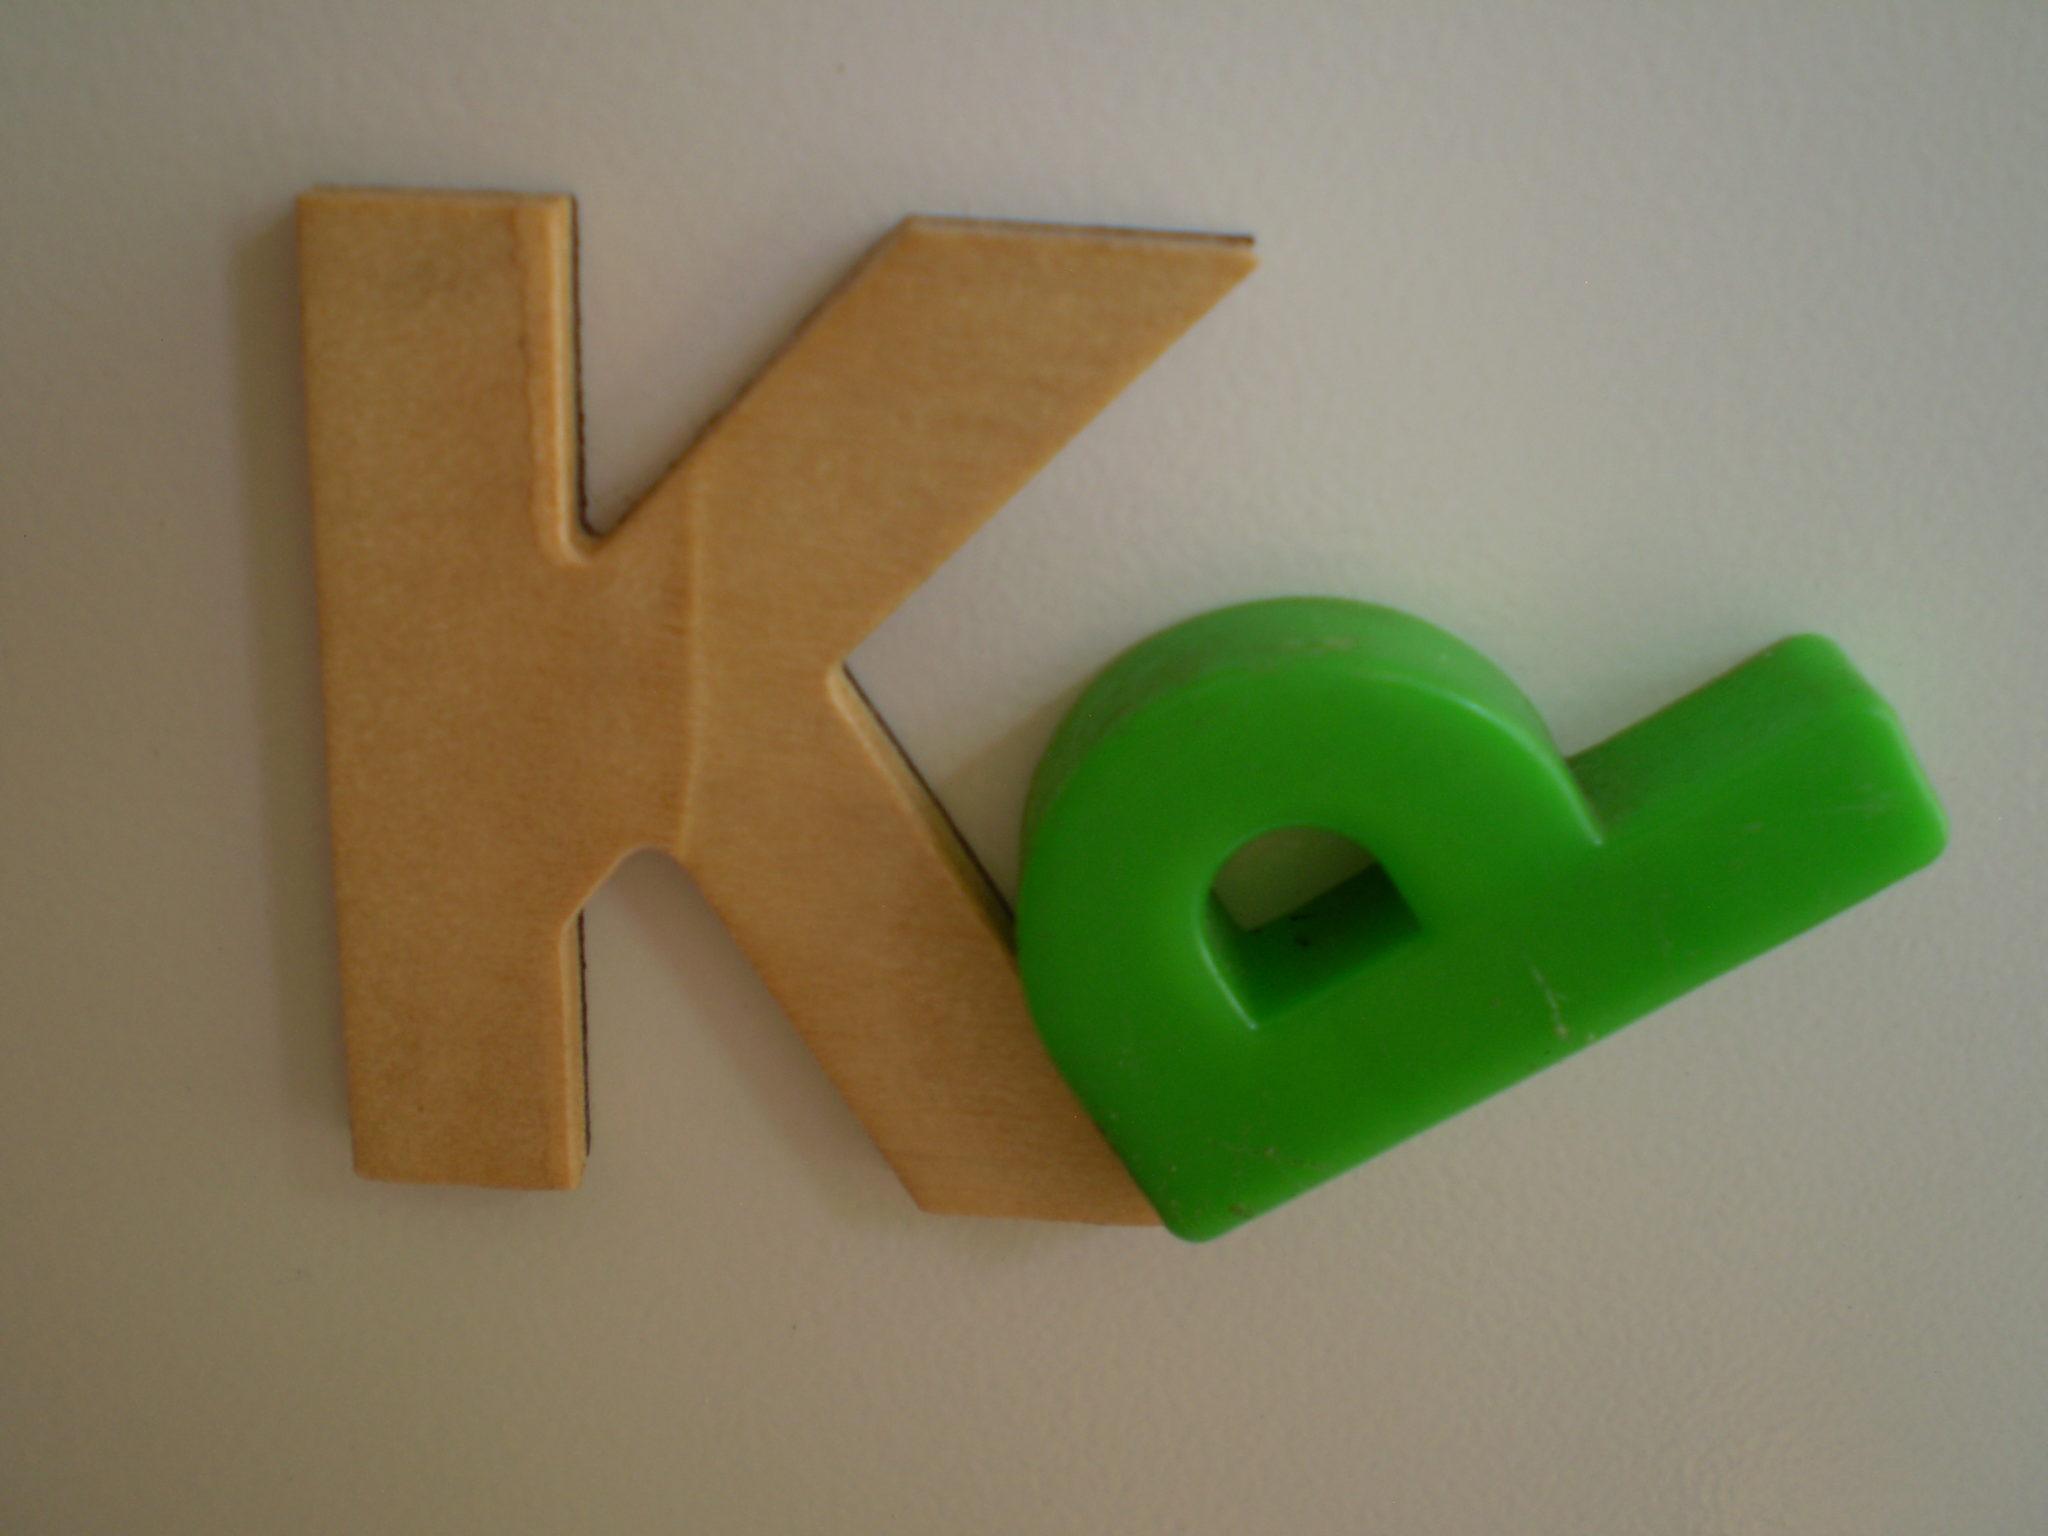 The K&D Stylings logo